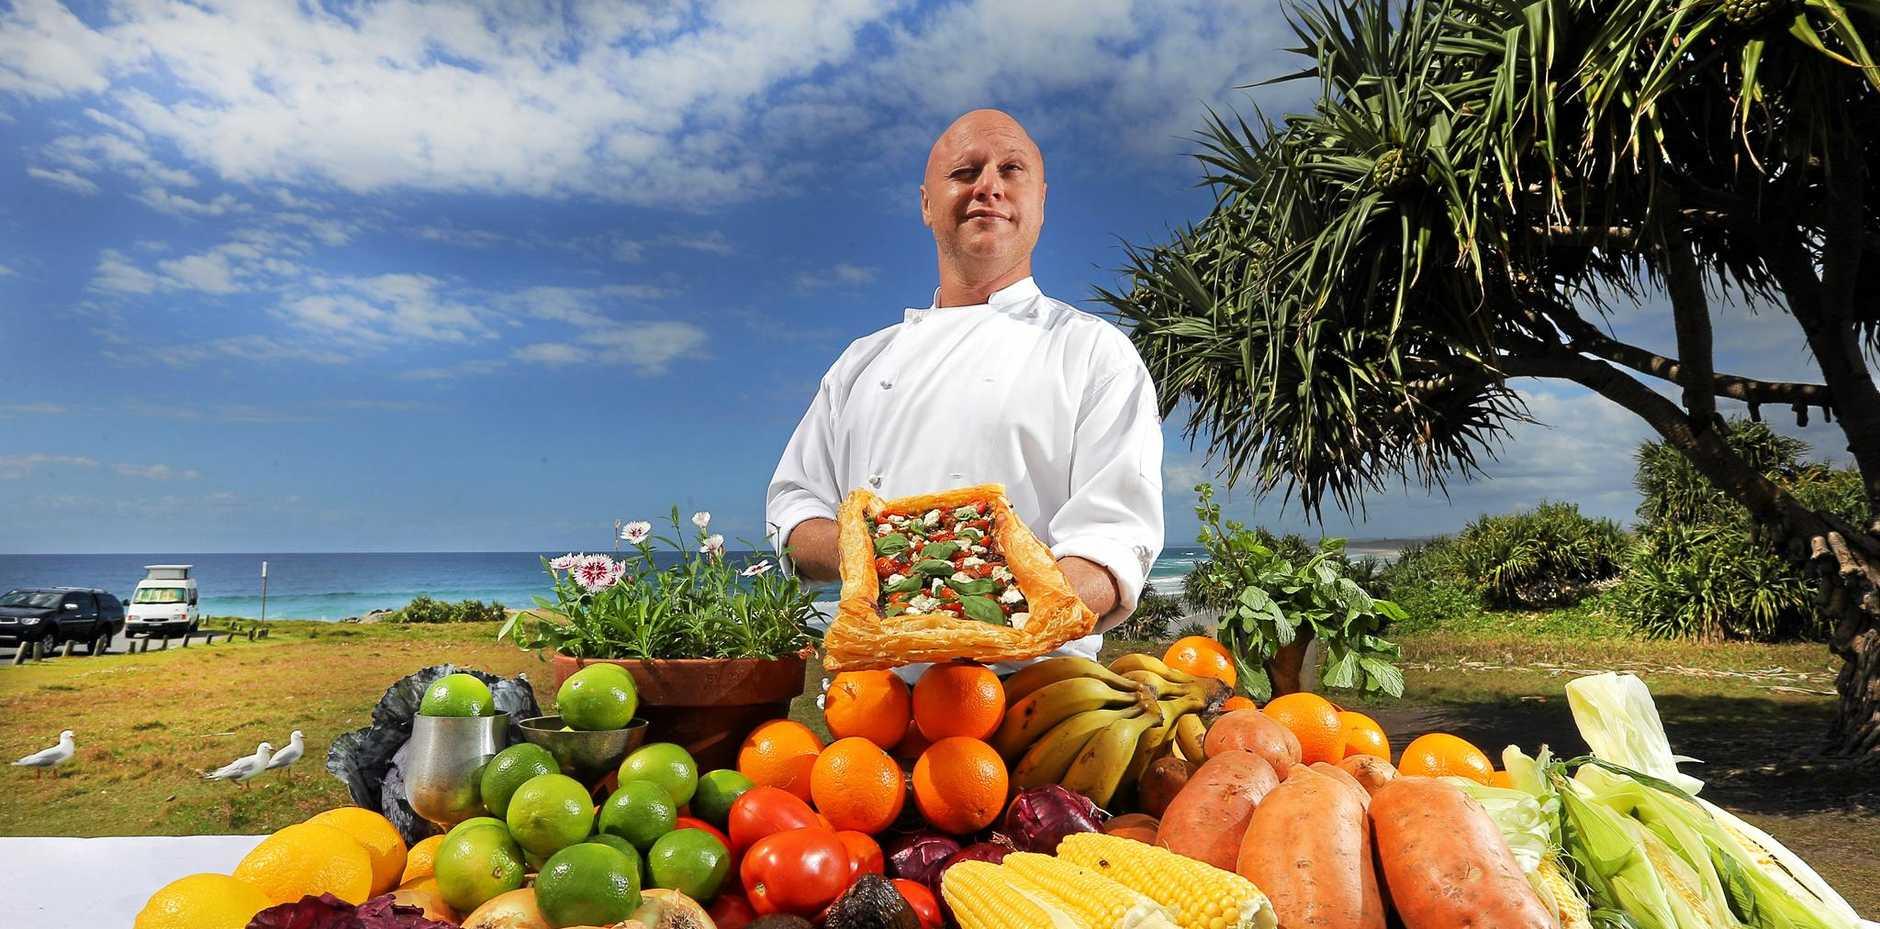 YUM YUM Black Oak chef Doron Daws prepares for the Tweed Foodie Fest on Saturday. PHOTO: Scott Powick